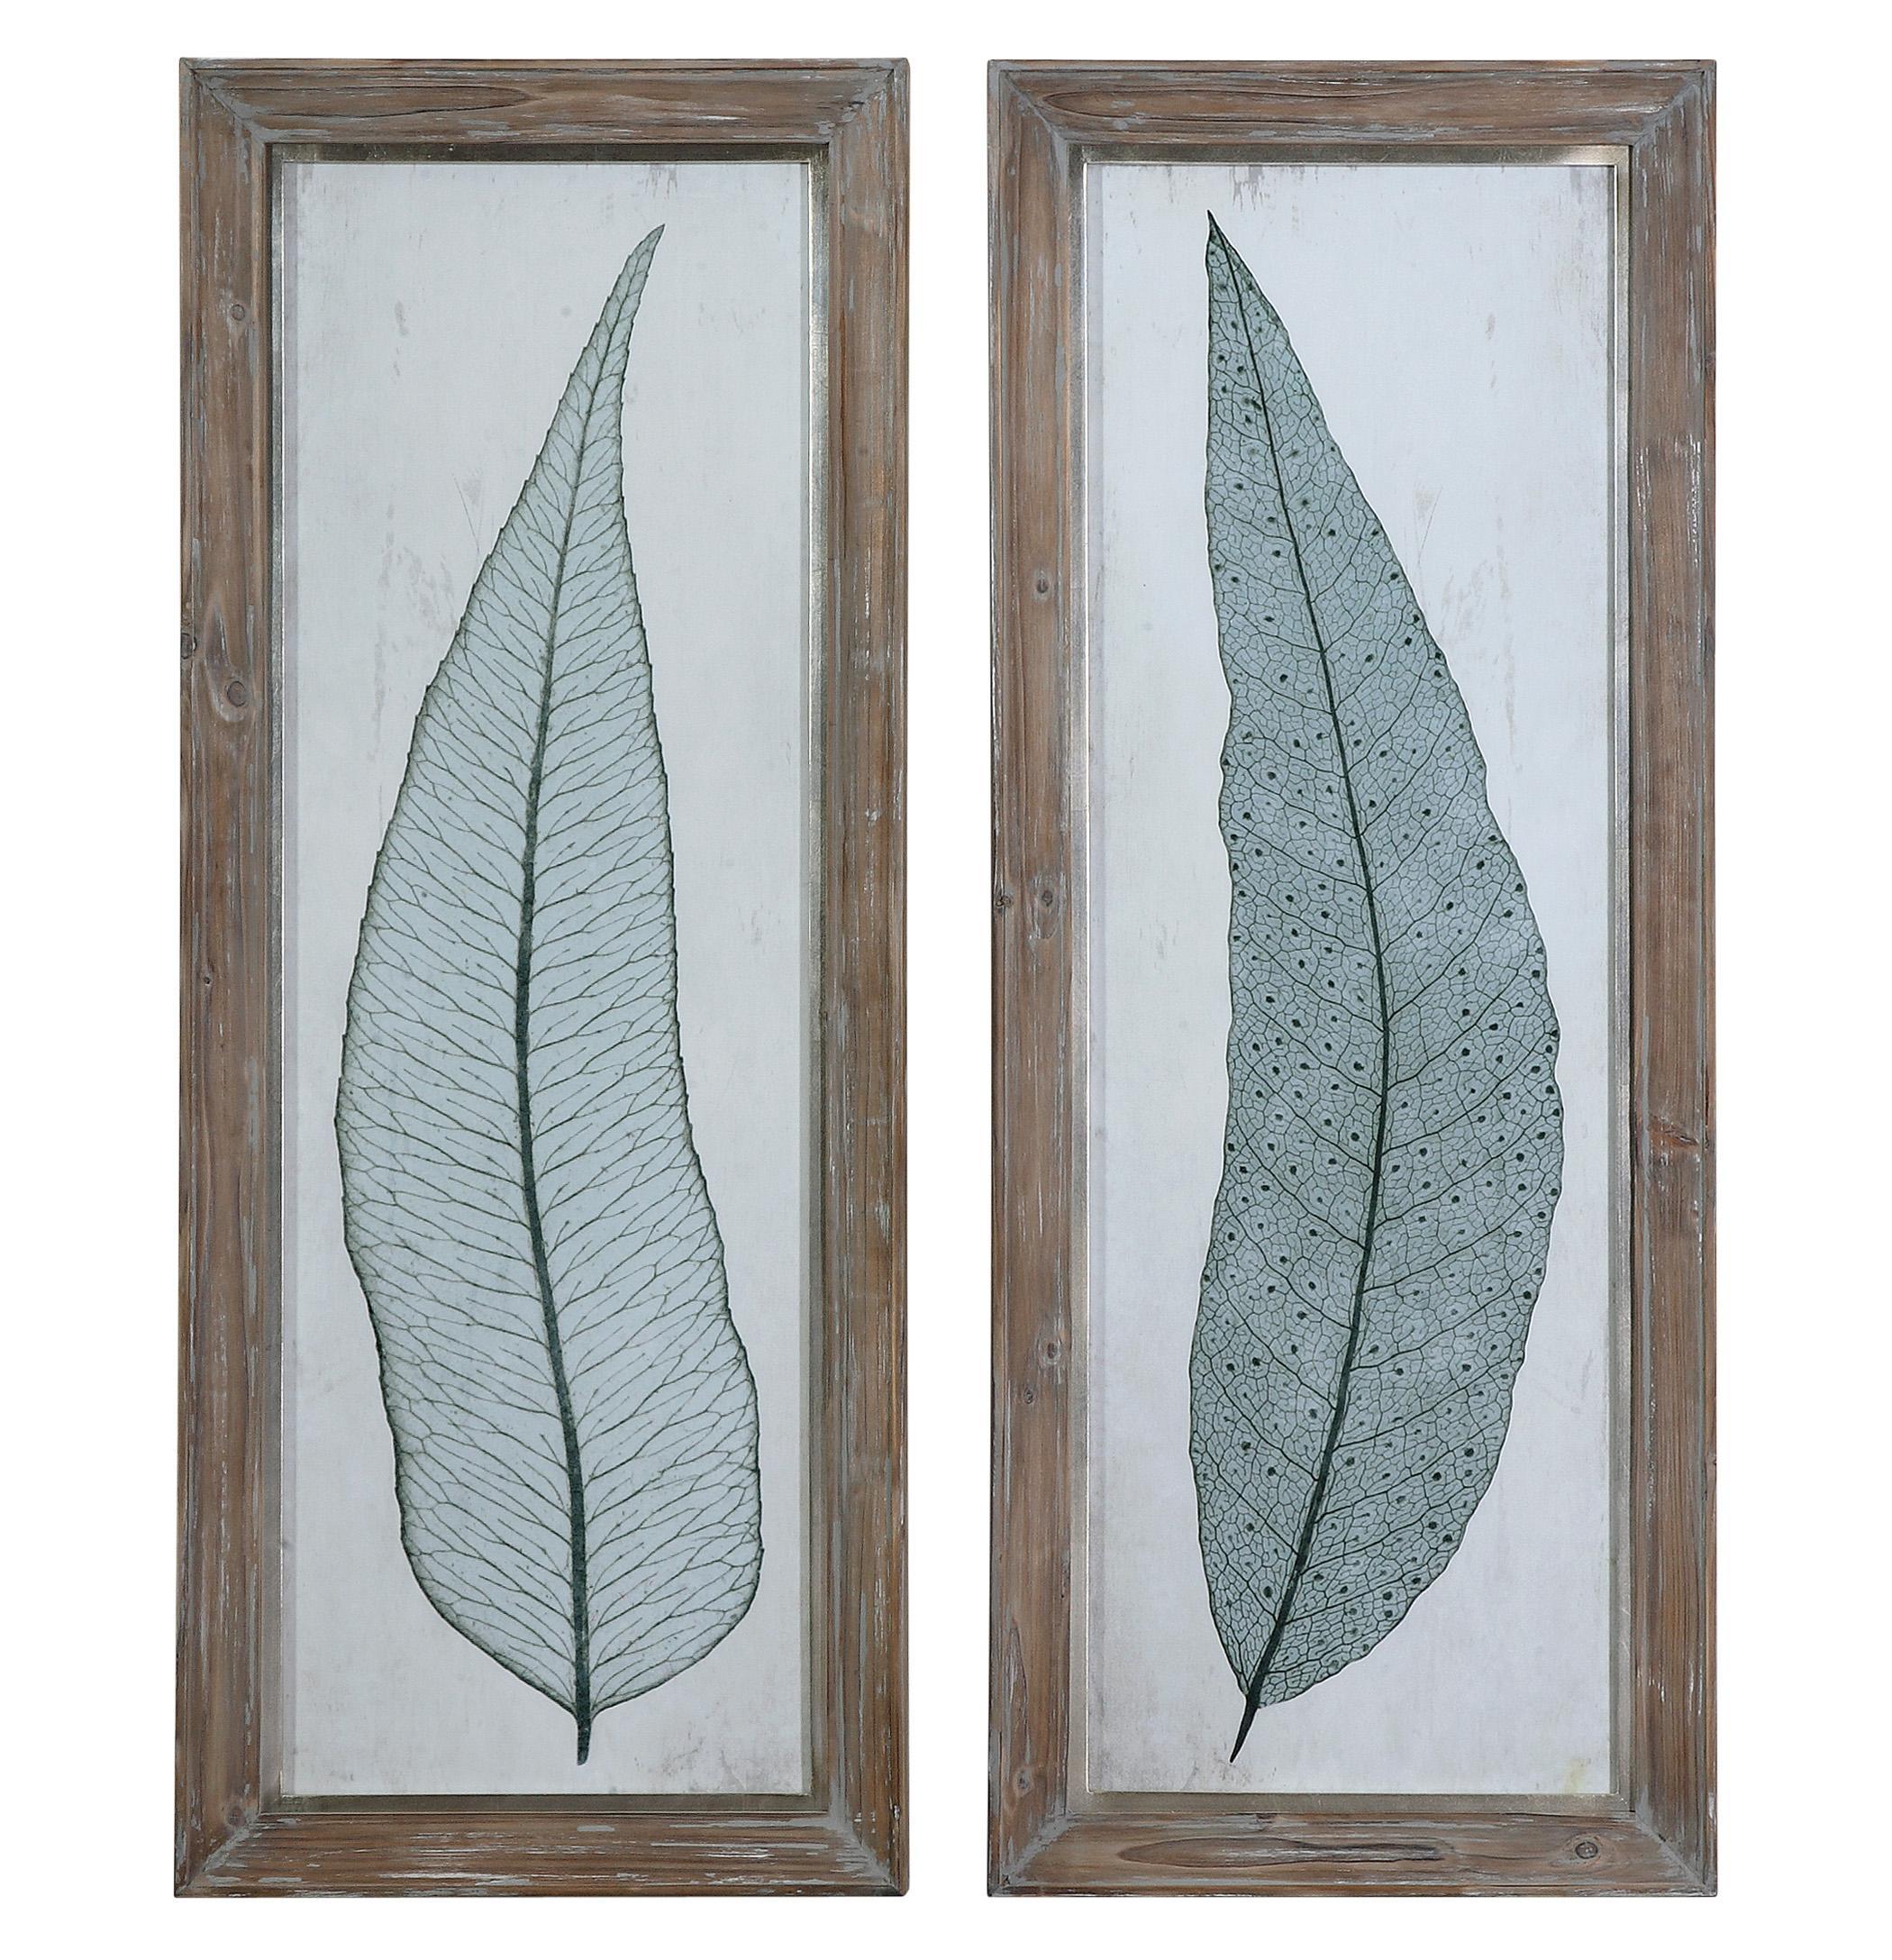 Framed Prints Tall Leaves Framed Art Set of 2 by Uttermost at Mueller Furniture